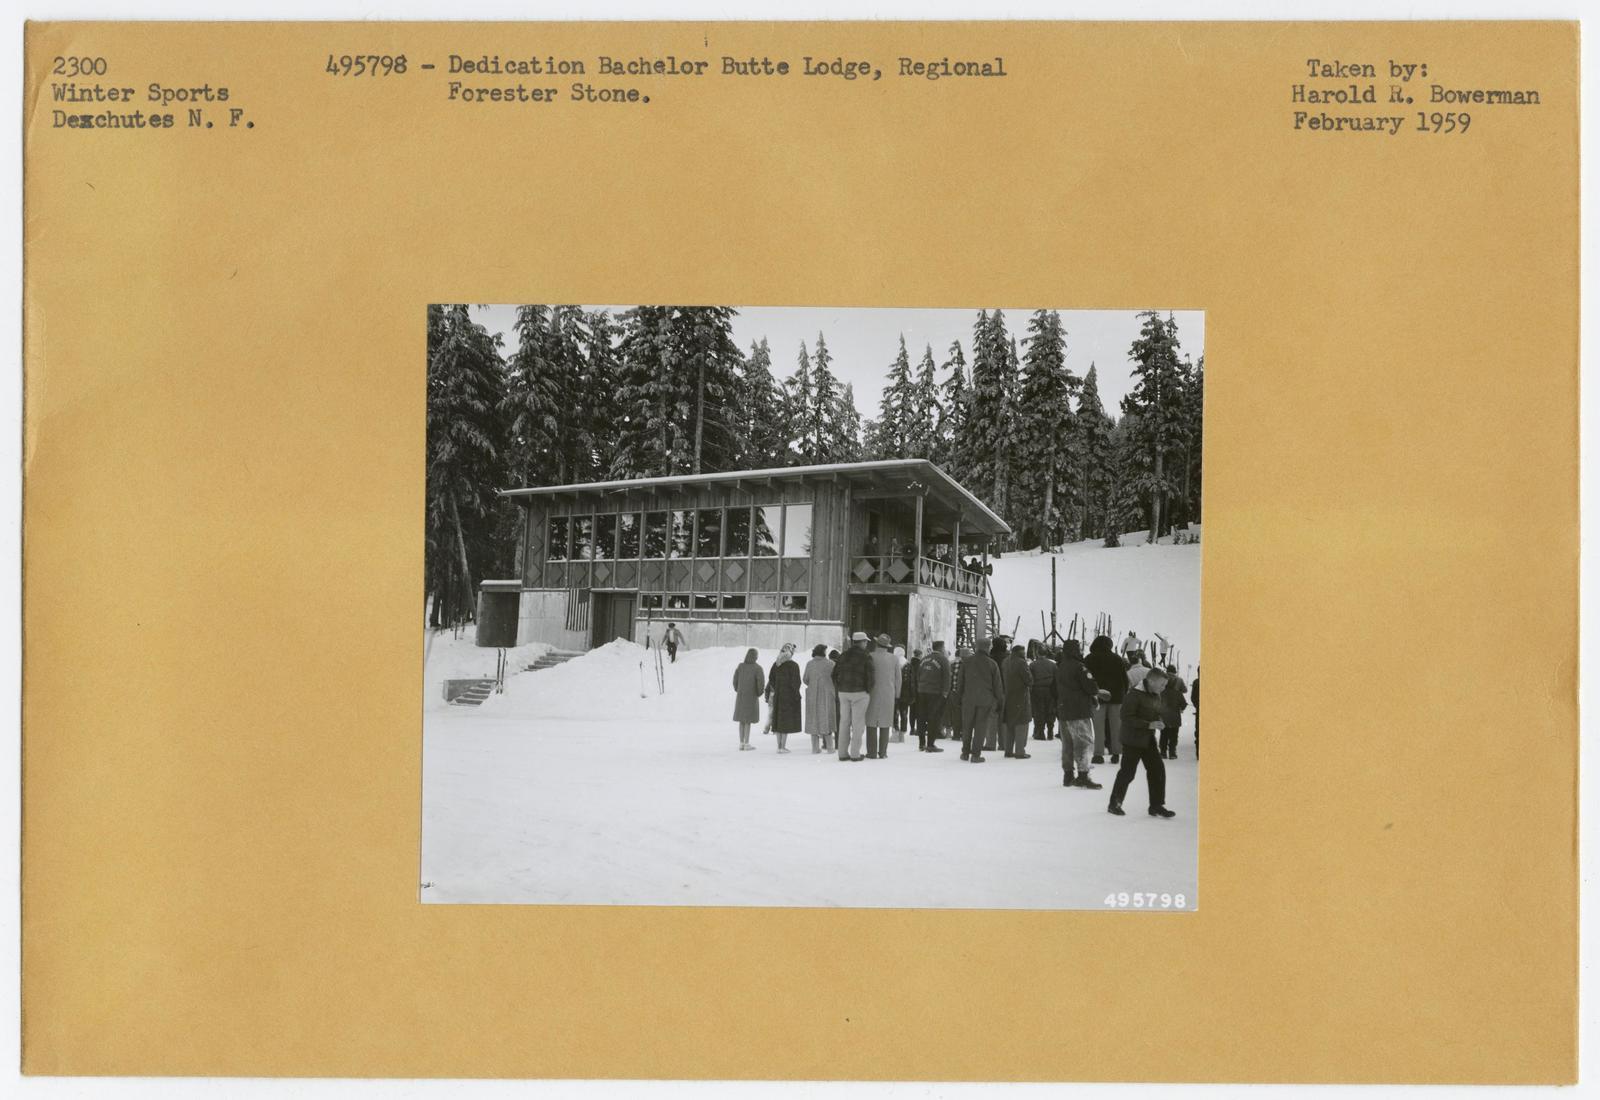 Winter Sports: General